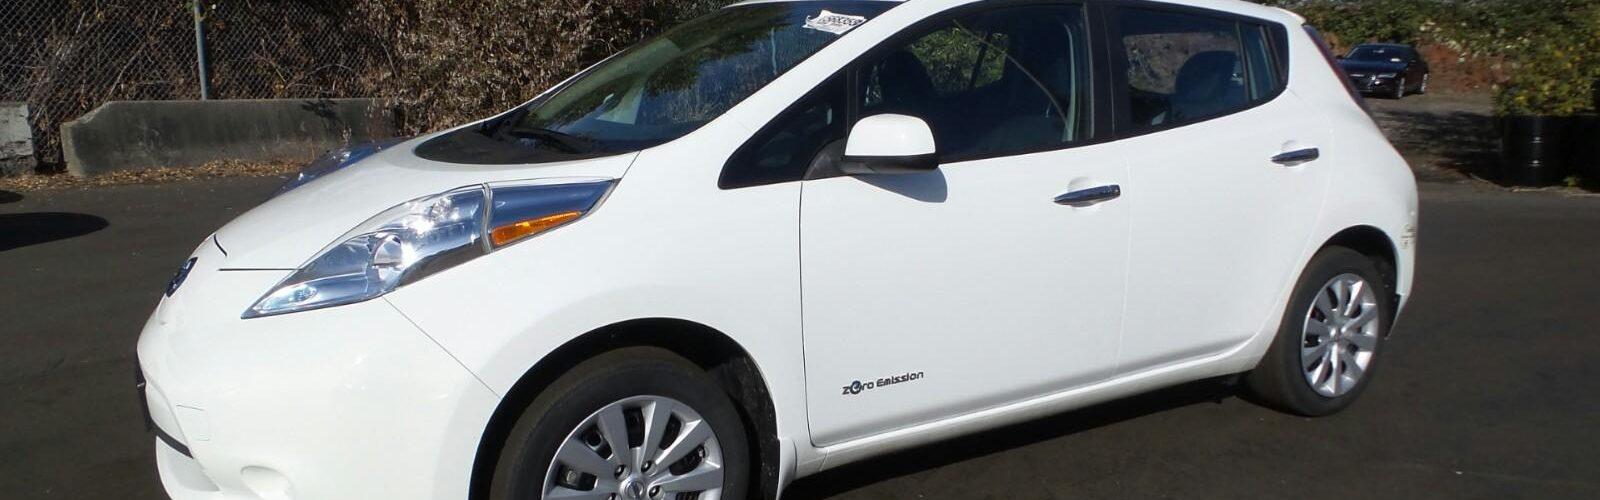 Nissan LEAF 2015 S – 37 956 Km – 18 400 $  – VENDU!